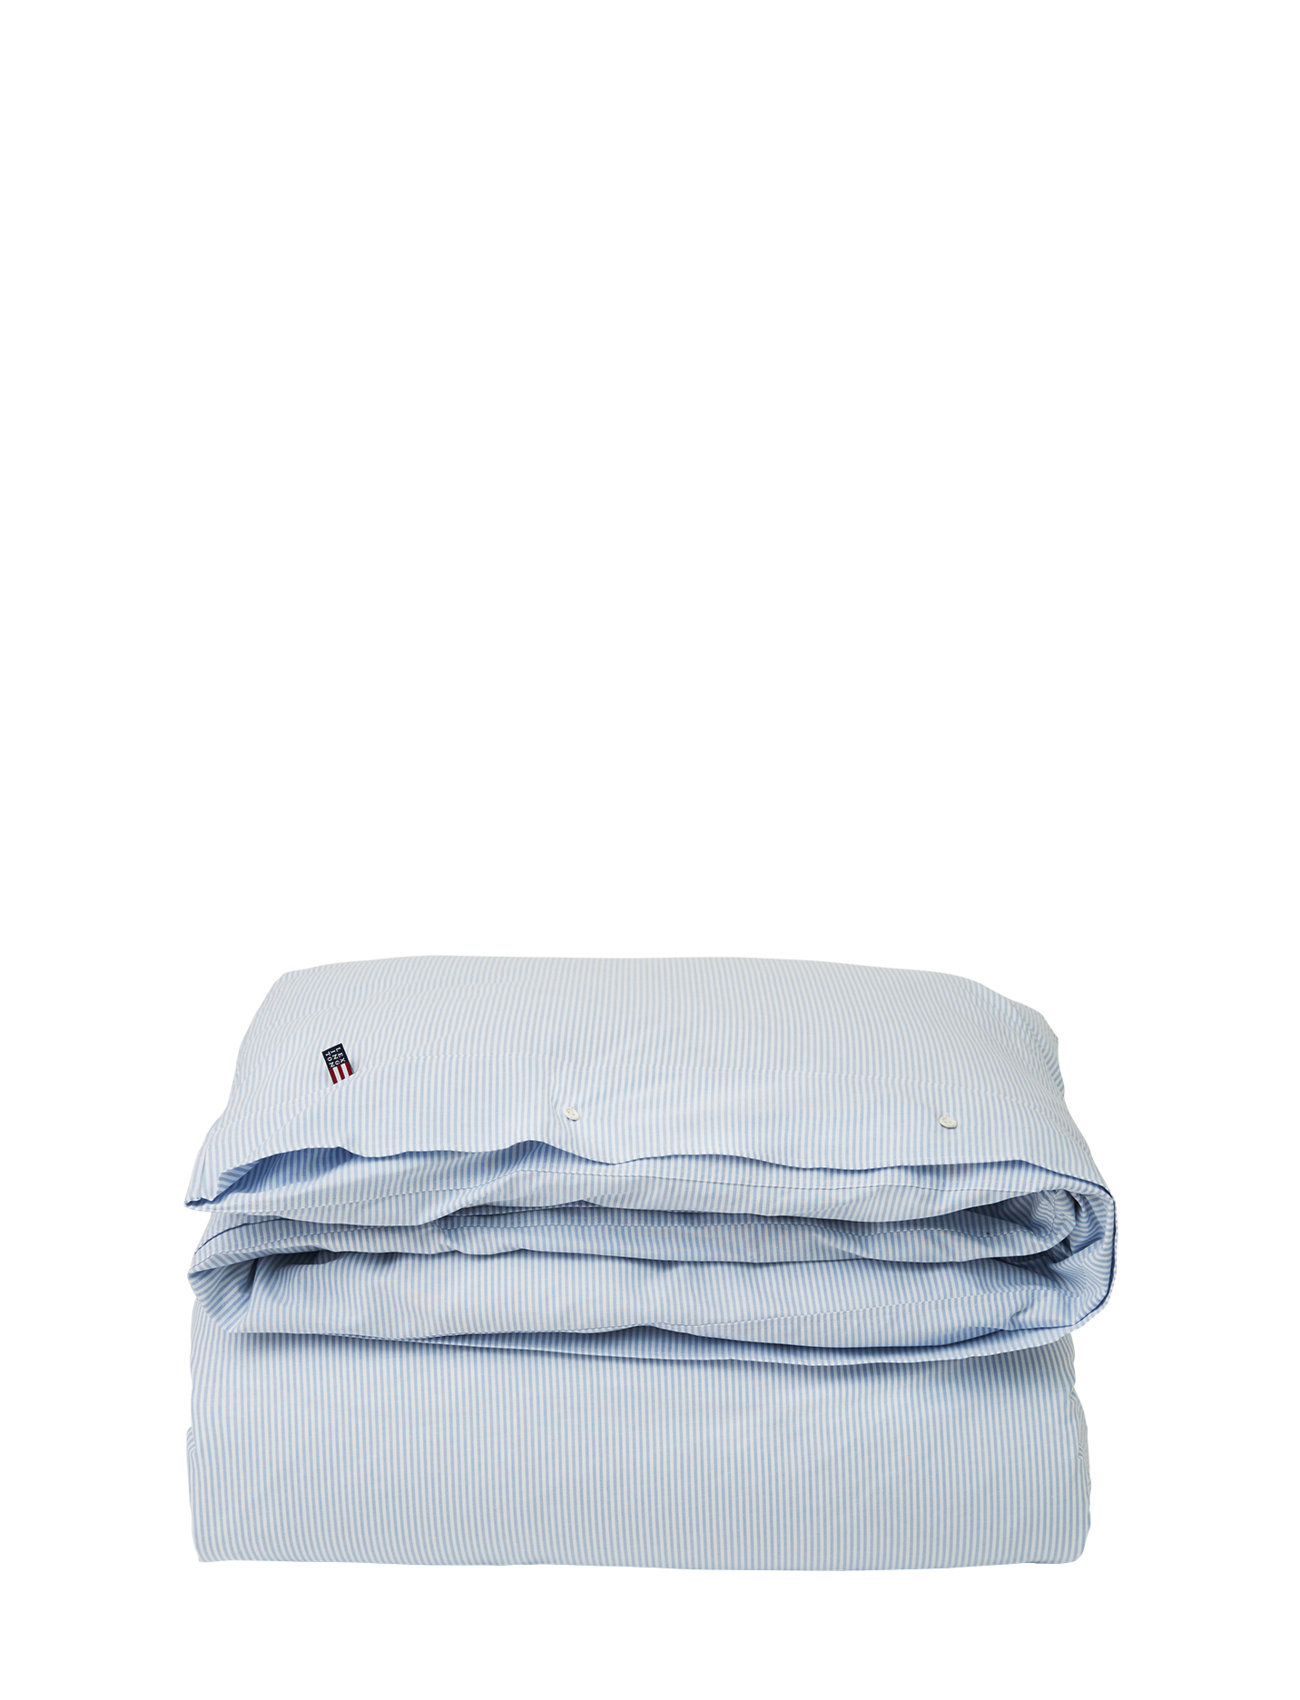 Lexington Home Pin Point Blue/White Duvet - BLUE/WHITE